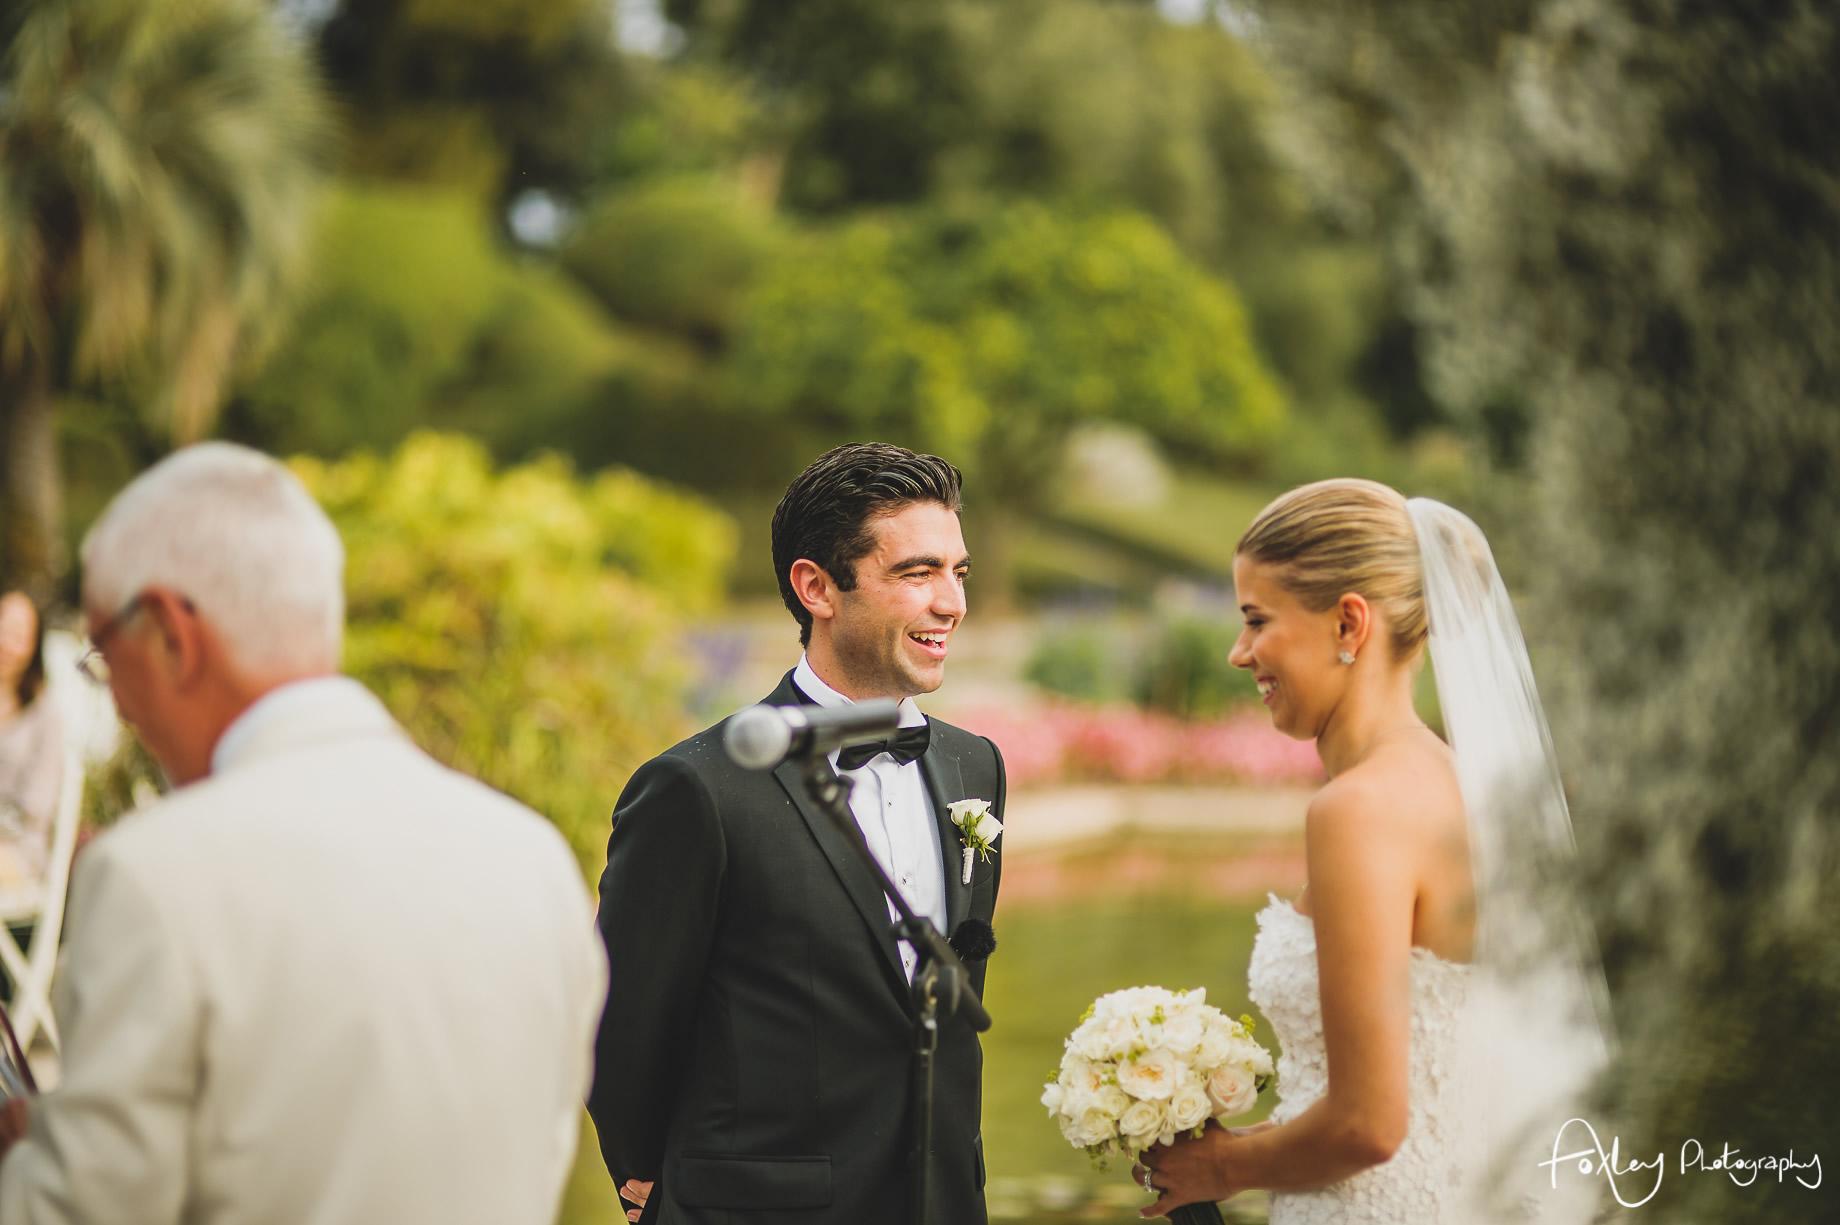 Jil and Will's Wedding at Villa Ephrussi De Rothschild 107